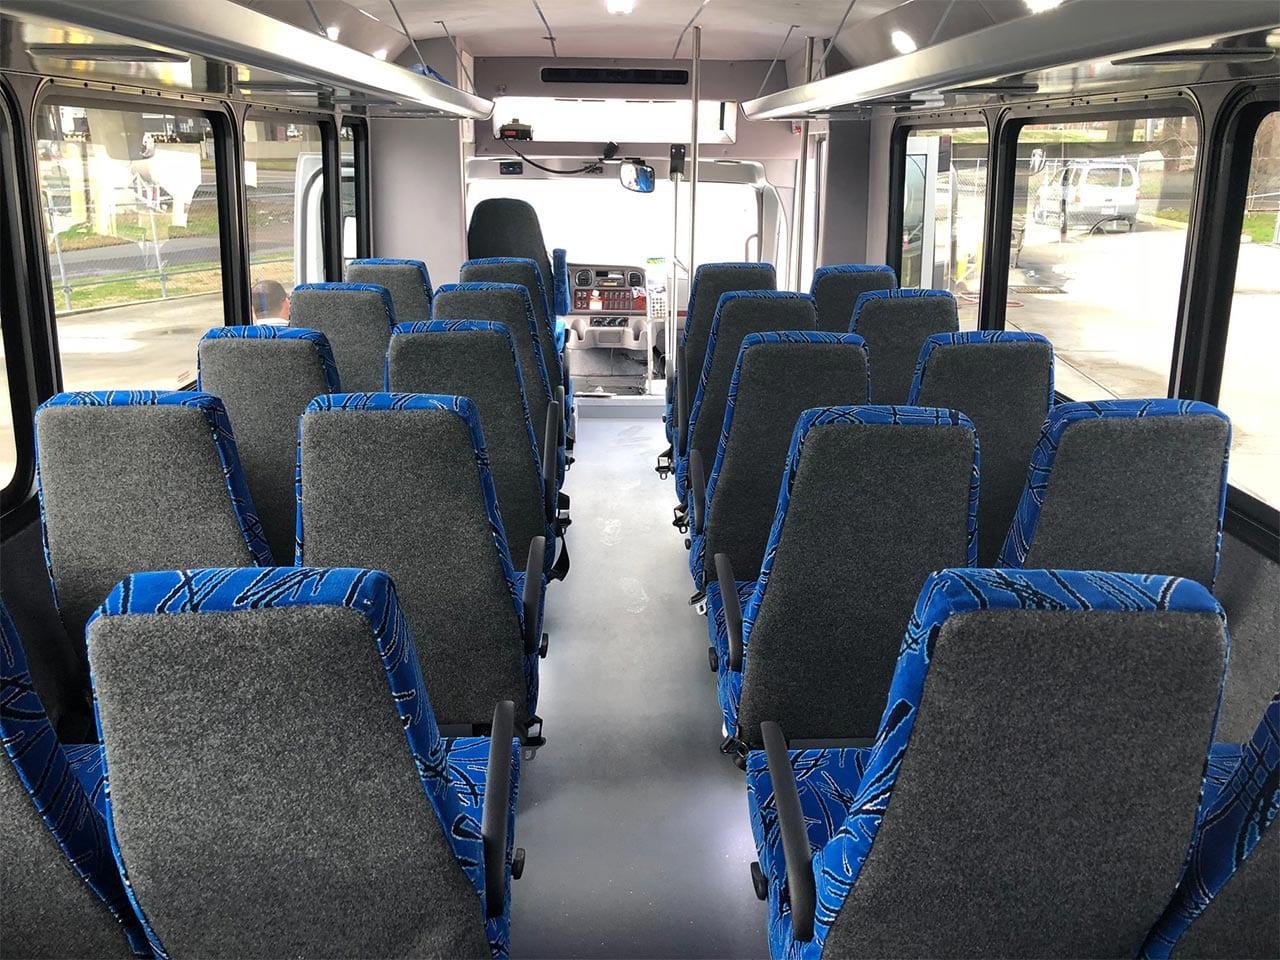 29 passenger minibus inside